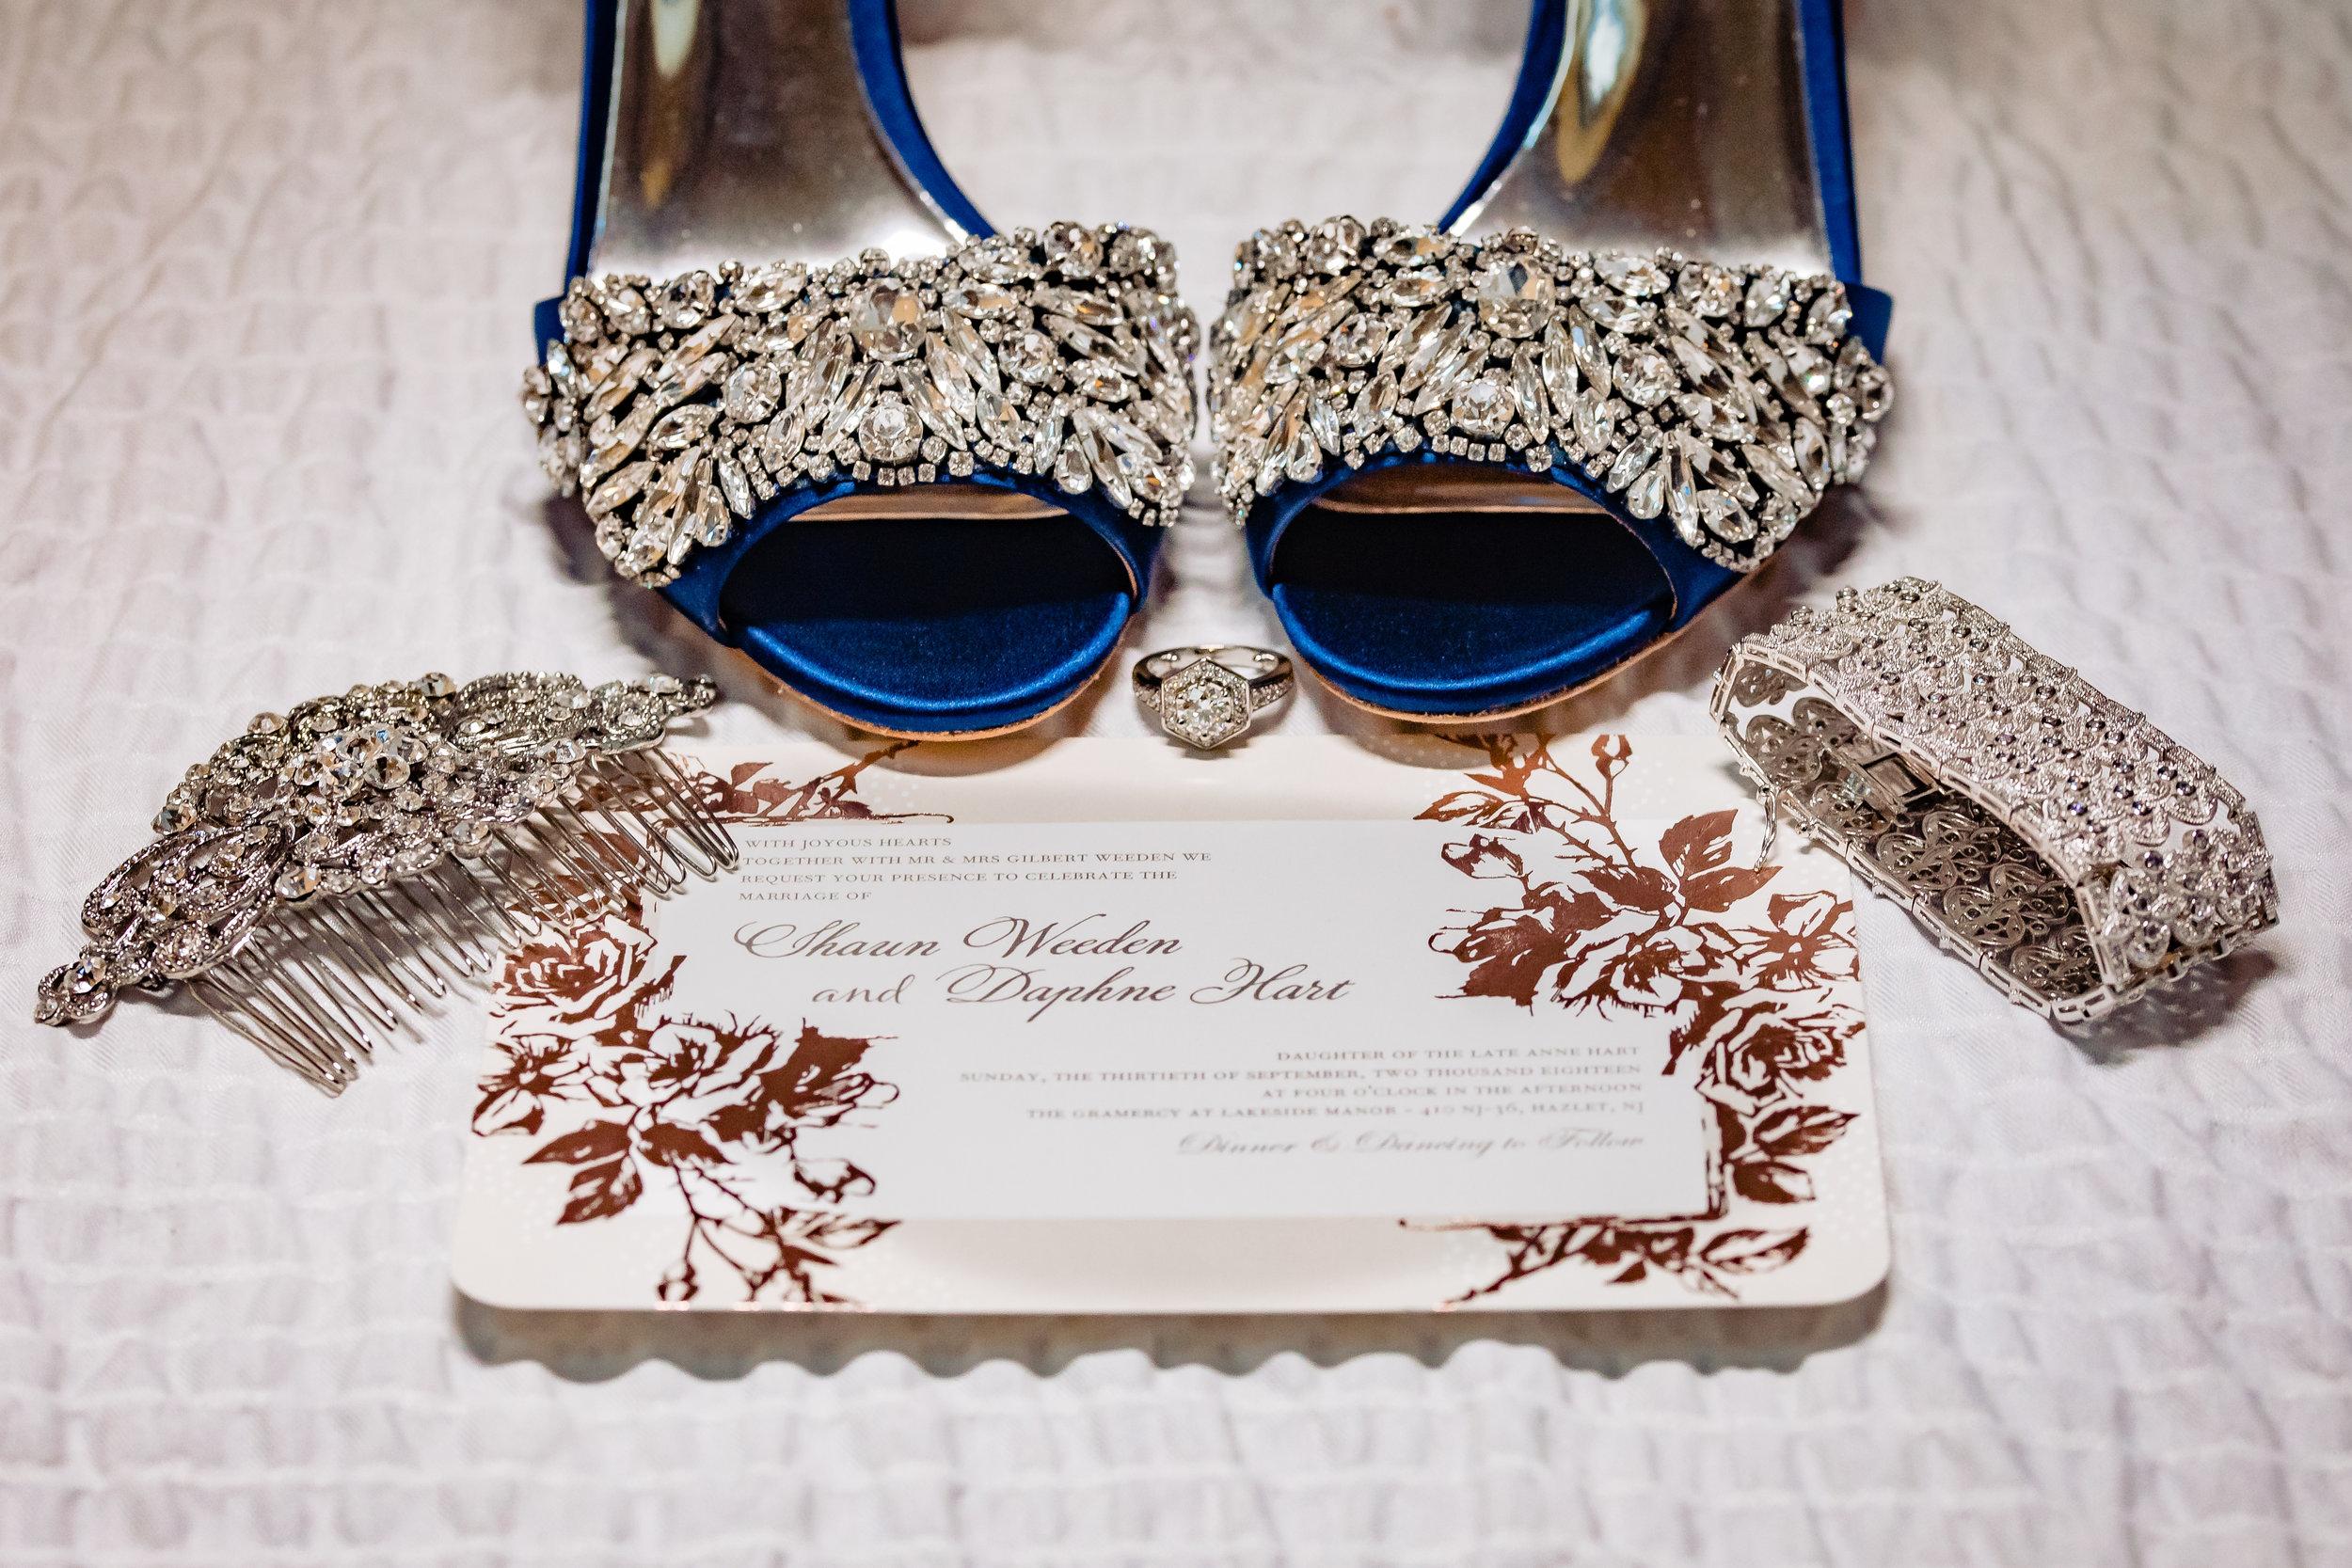 wedding shoes, invitation, jewelry, hair clip, bracelet, details